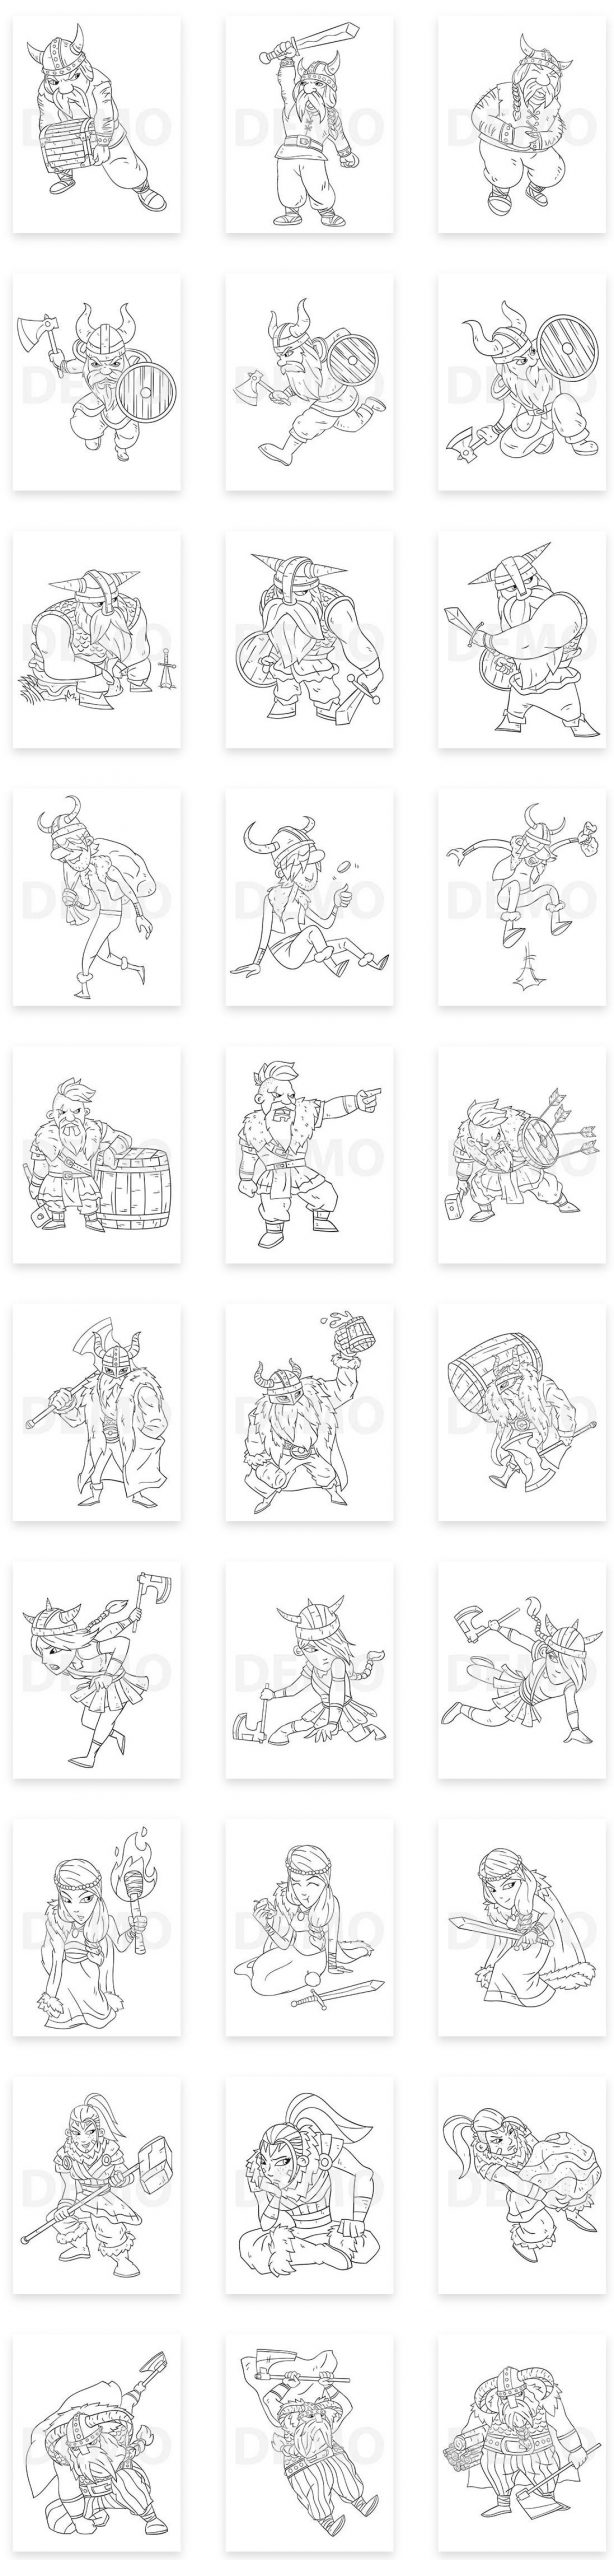 Viking-Coloring-Pack-PLR-30-images